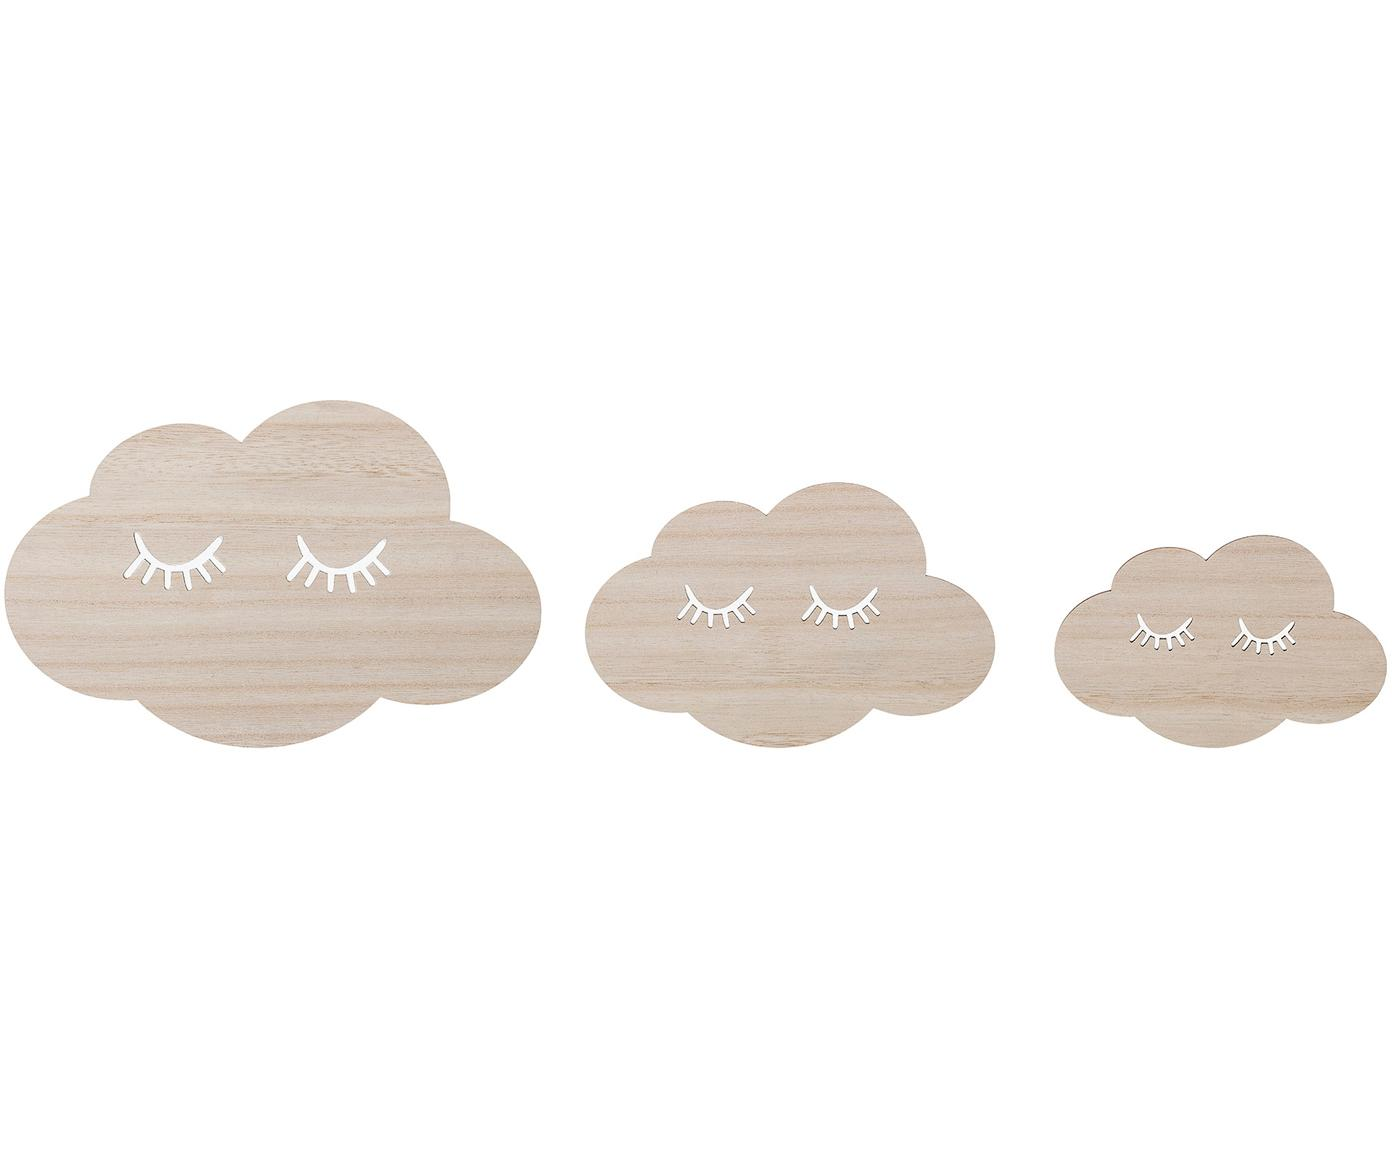 Set decorazioni da parete Clouds, 3 pz., Compensato, Beige, Diverse dimensioni